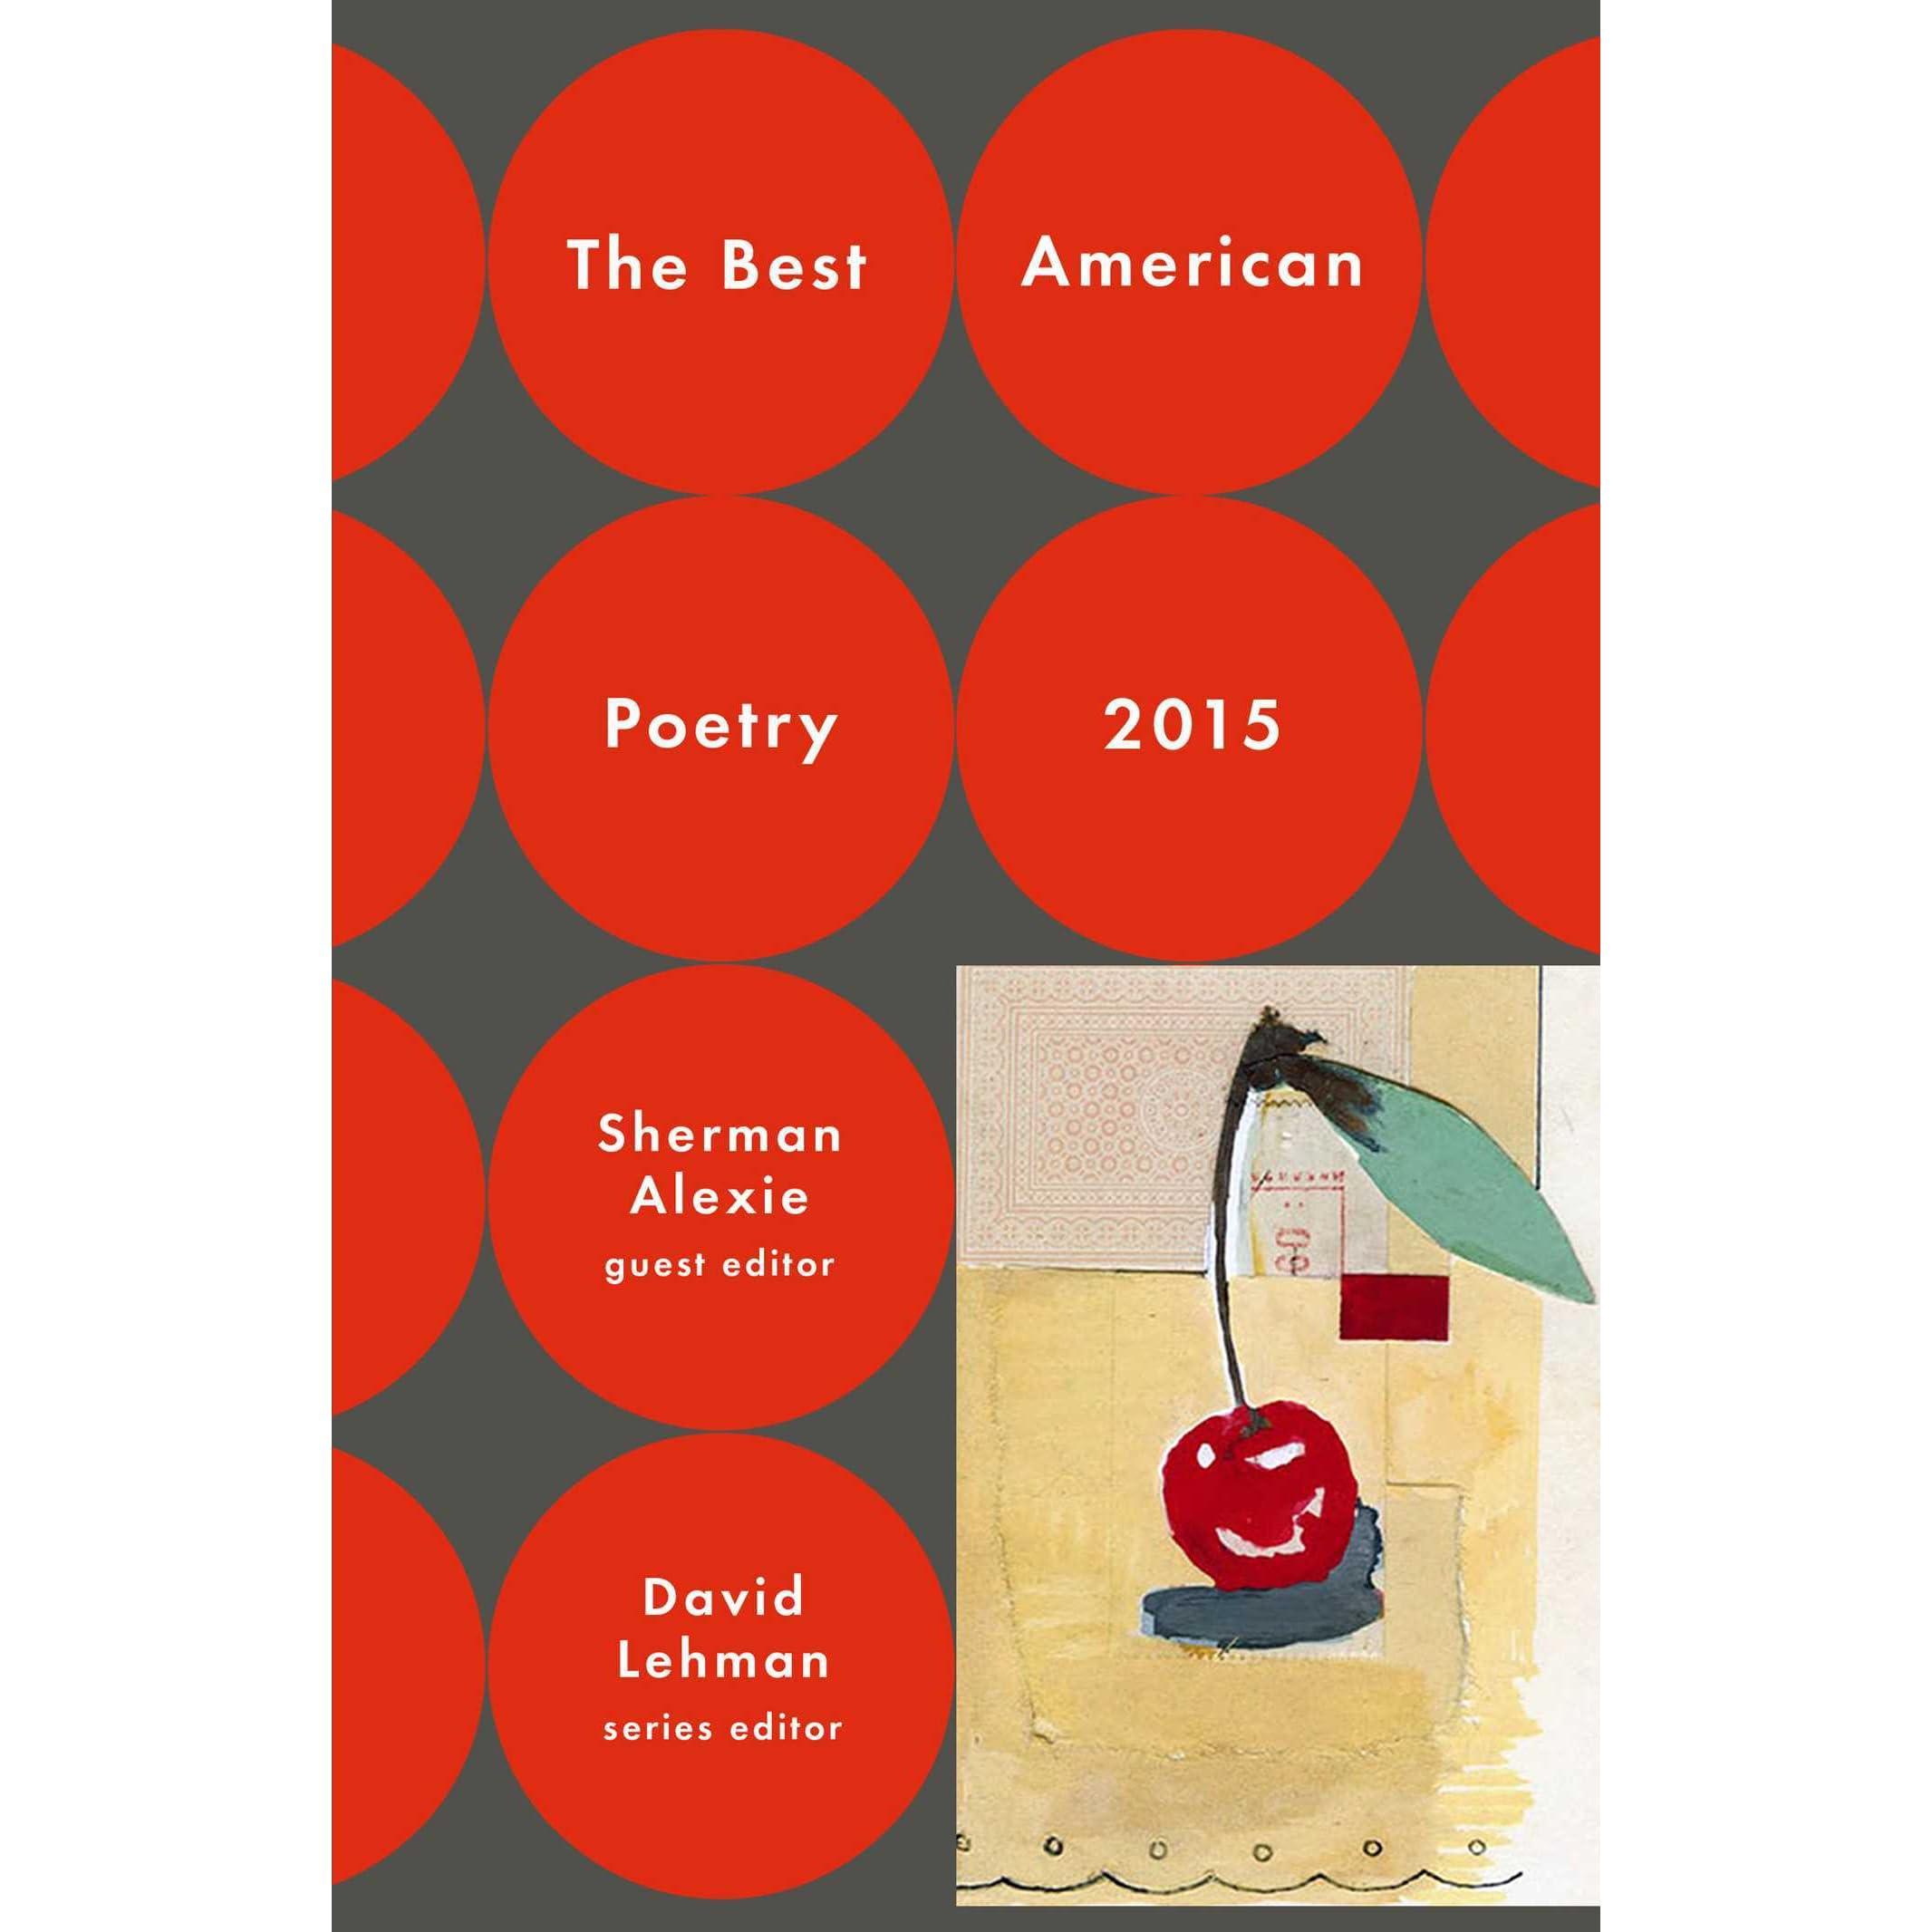 The Best American Poetry 2015 by Sherman Alexie